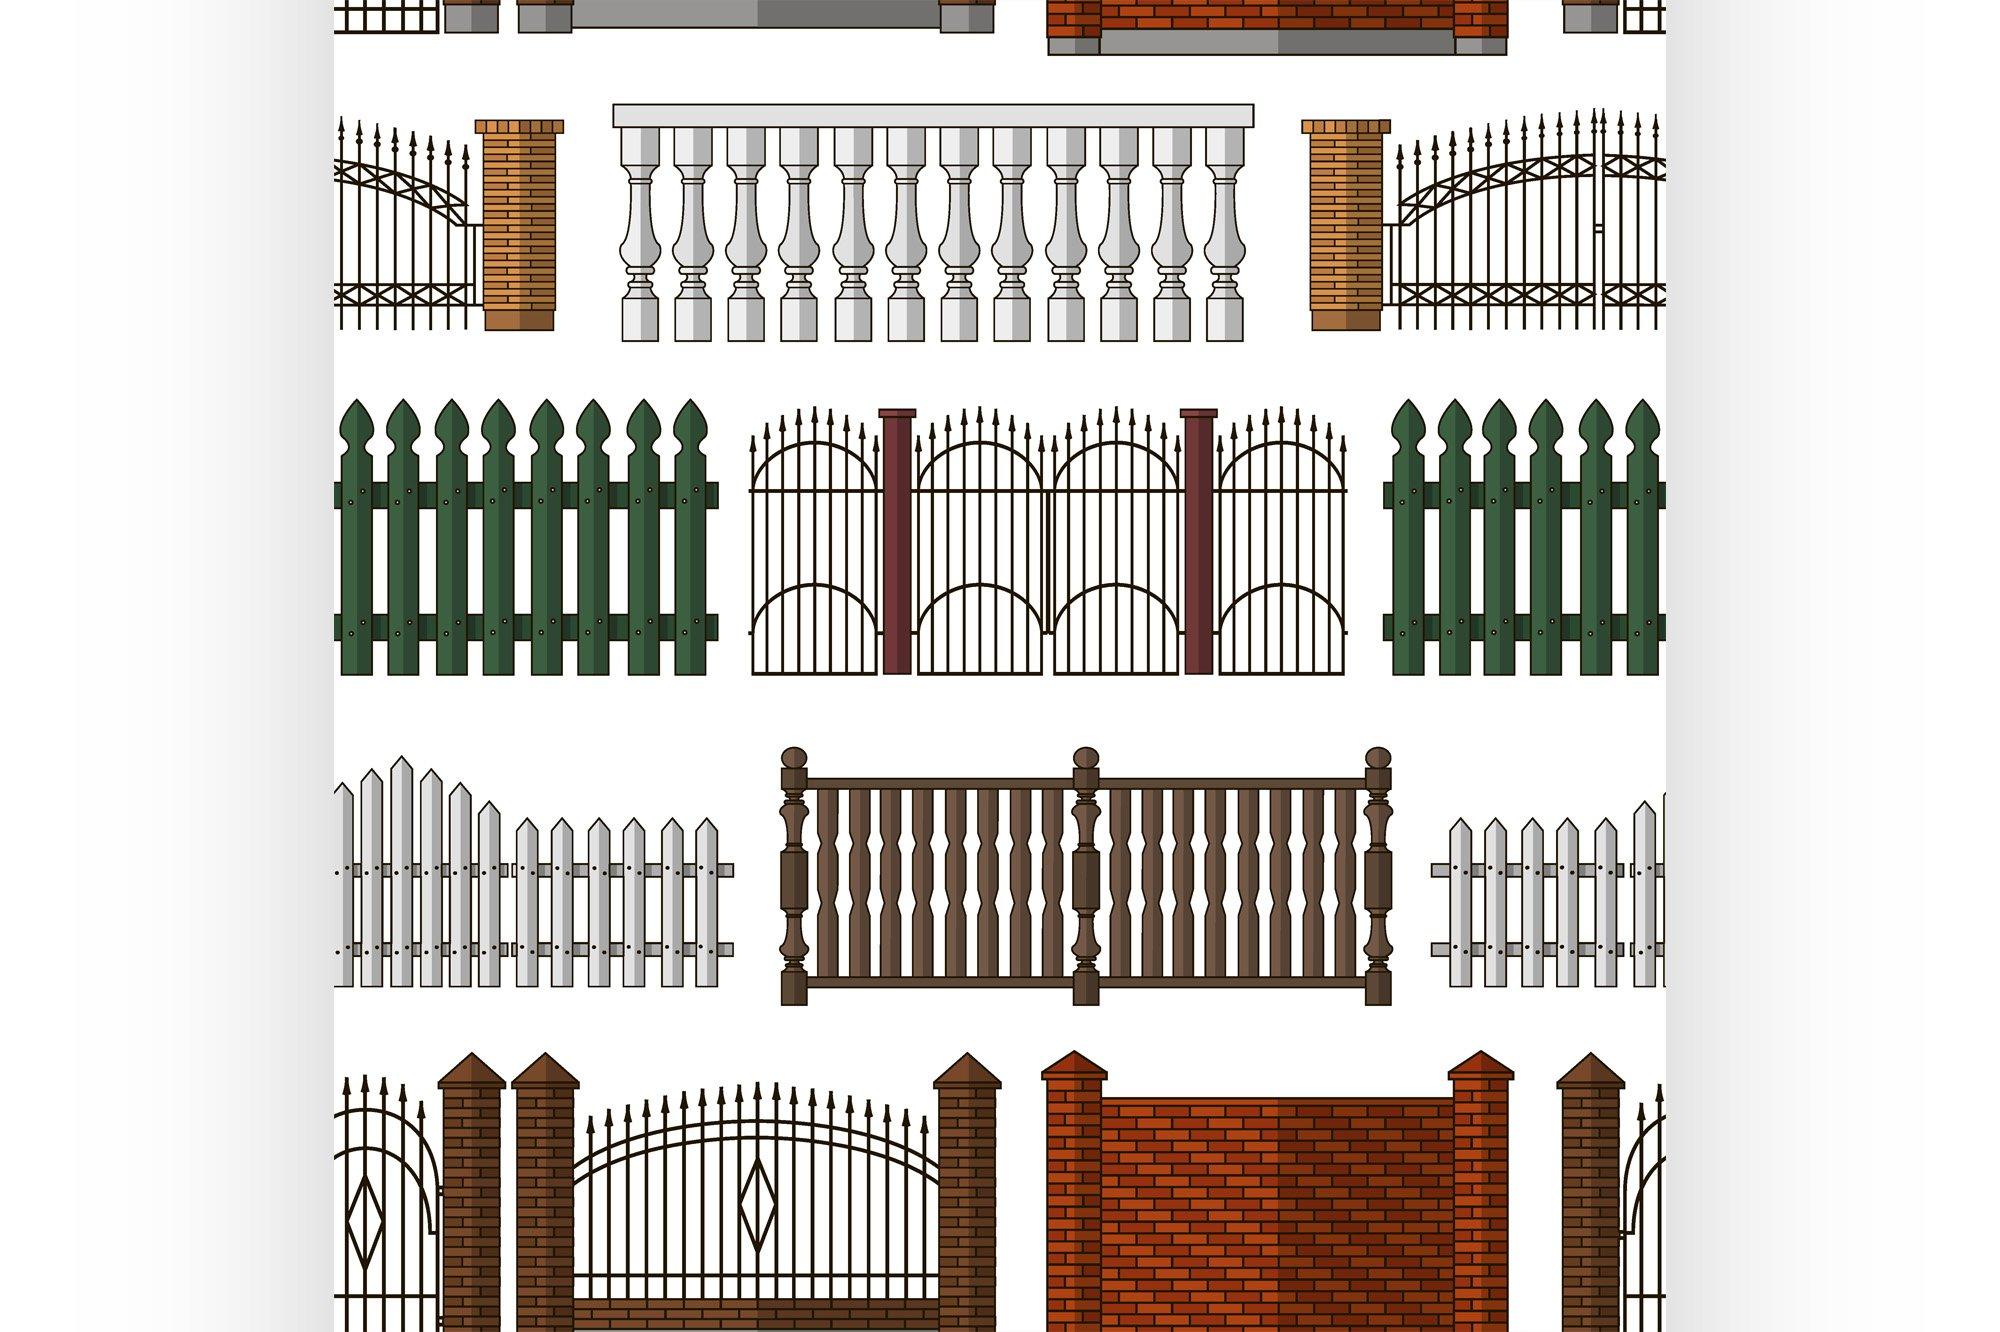 Set of gates and fences pattern example image 1